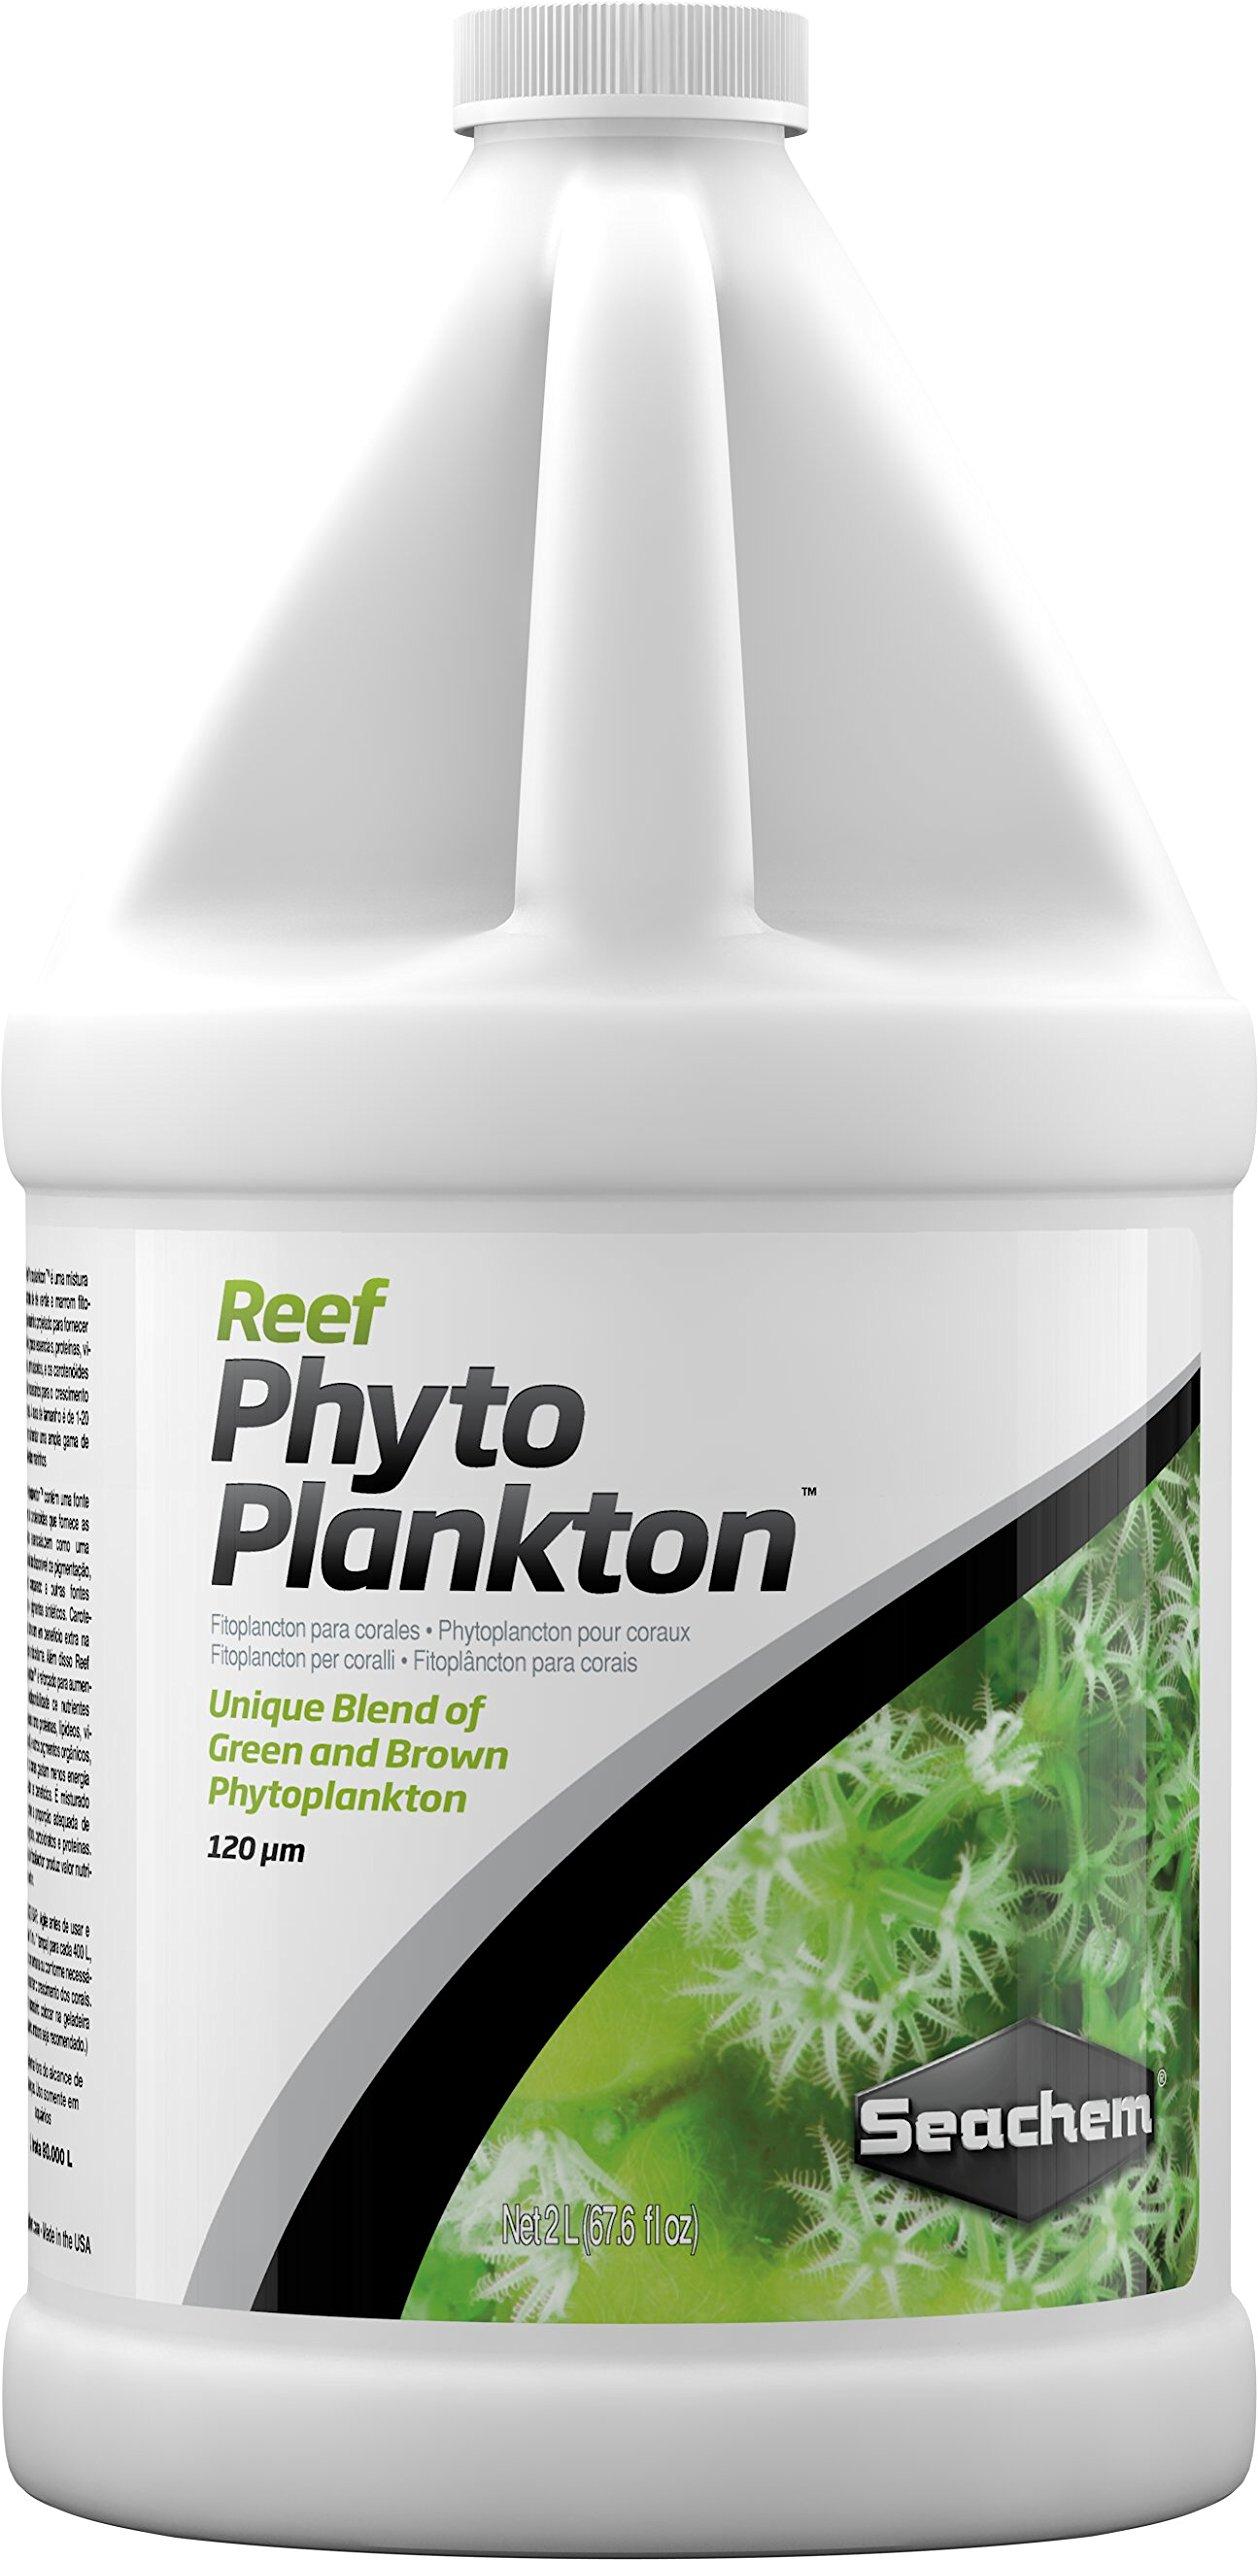 Reef Phytoplankton, 2 L / 67.6 fl. oz. by Seachem